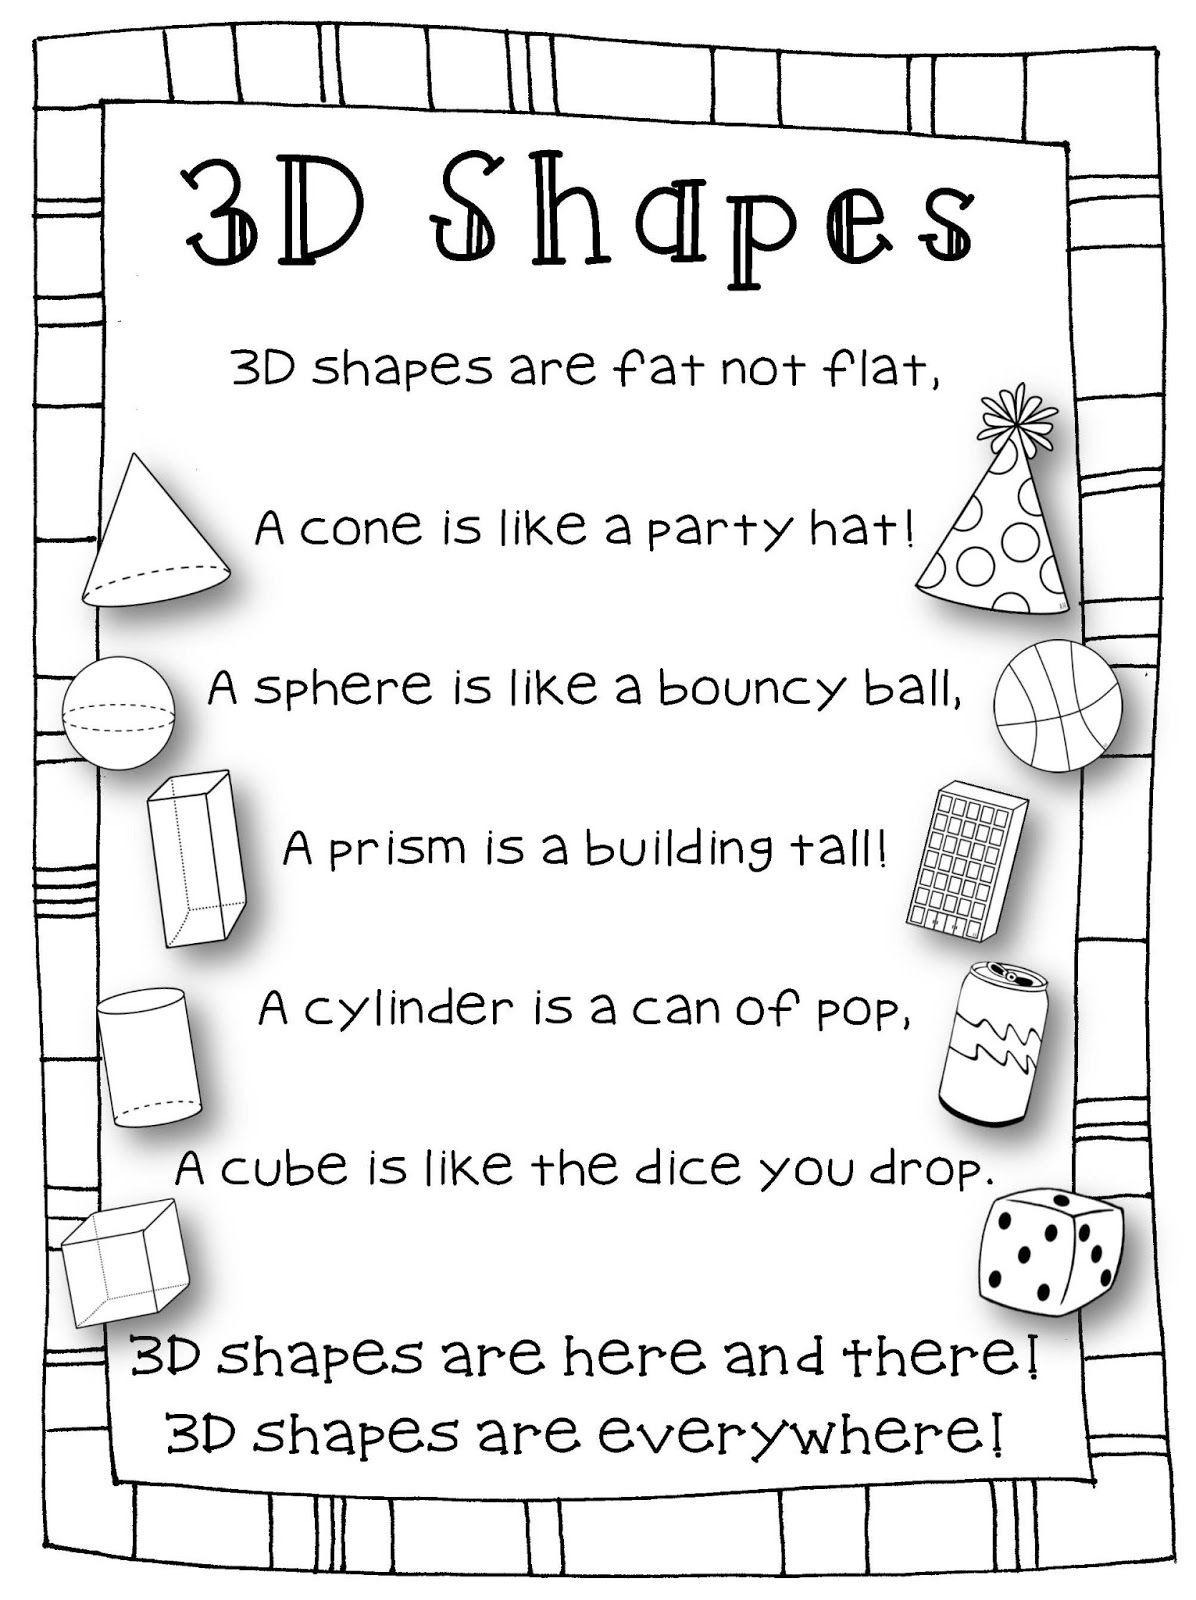 Shape Poems On Pinterest Shape Songs Preschool Classroom Themes And Shape Activities